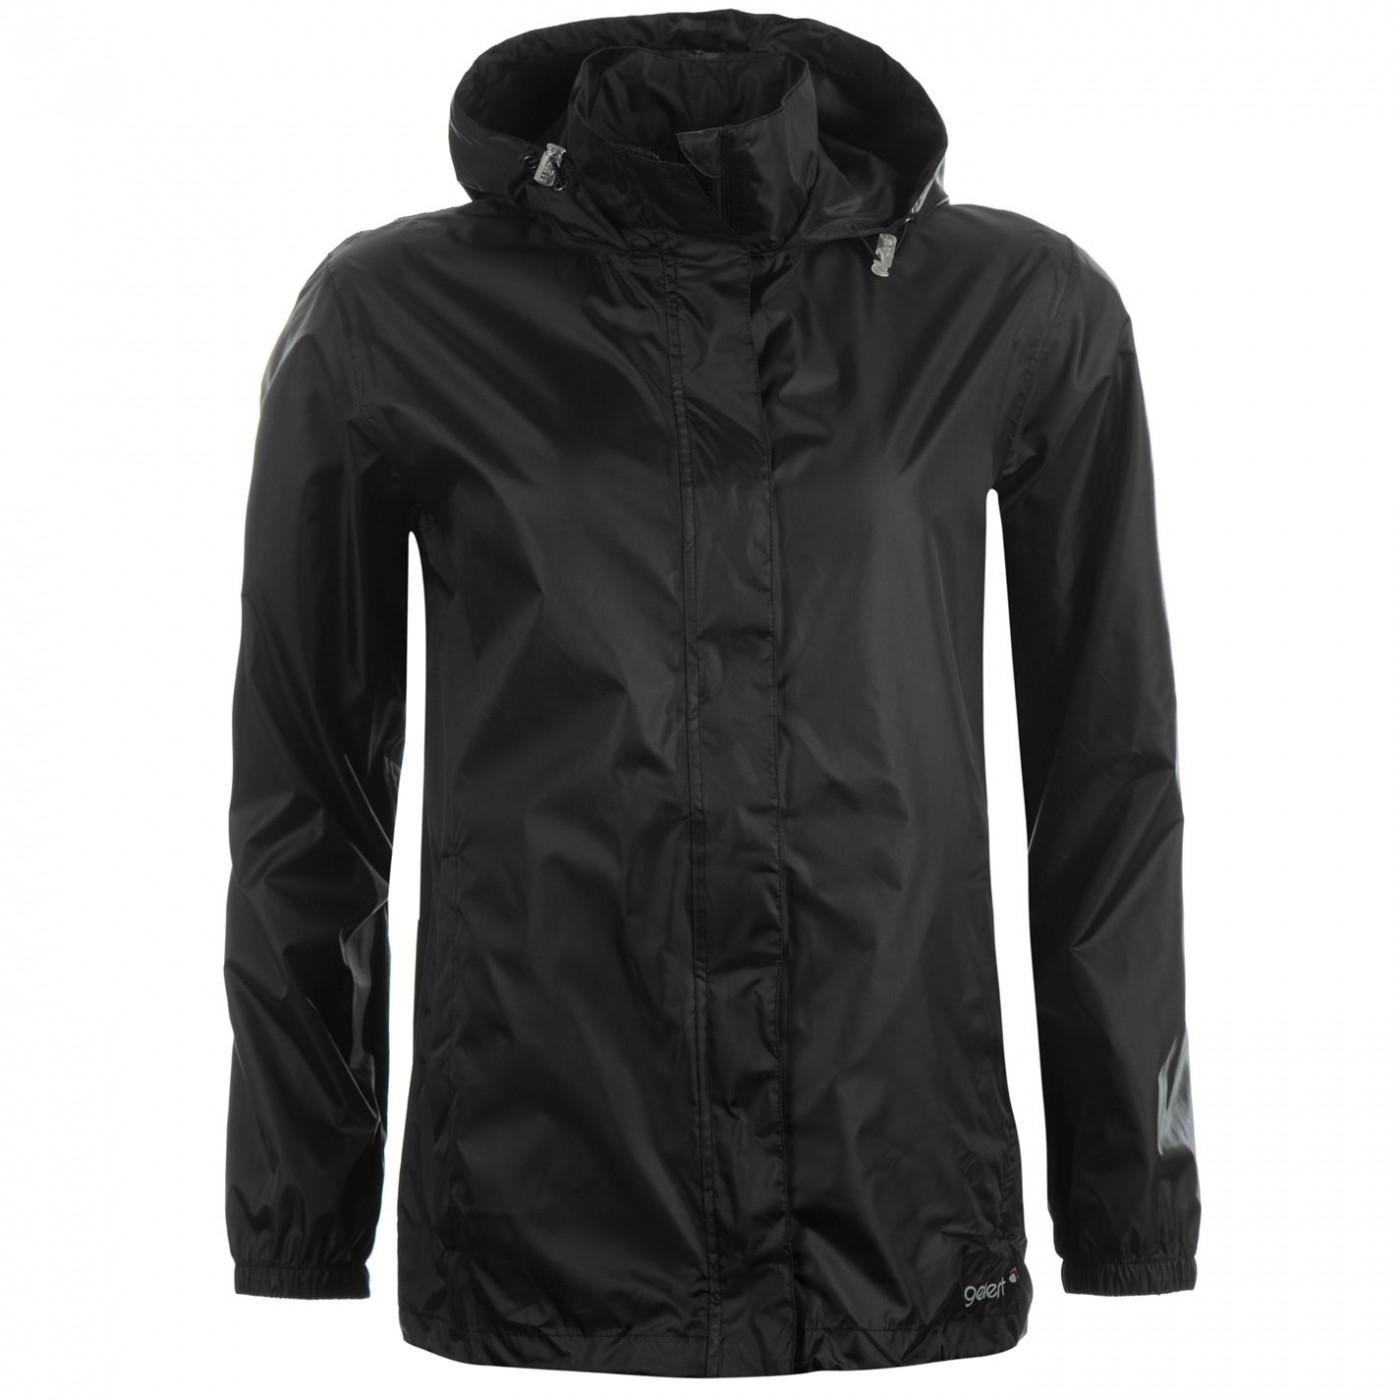 Women's jacket Gelert Packaway Waterproof